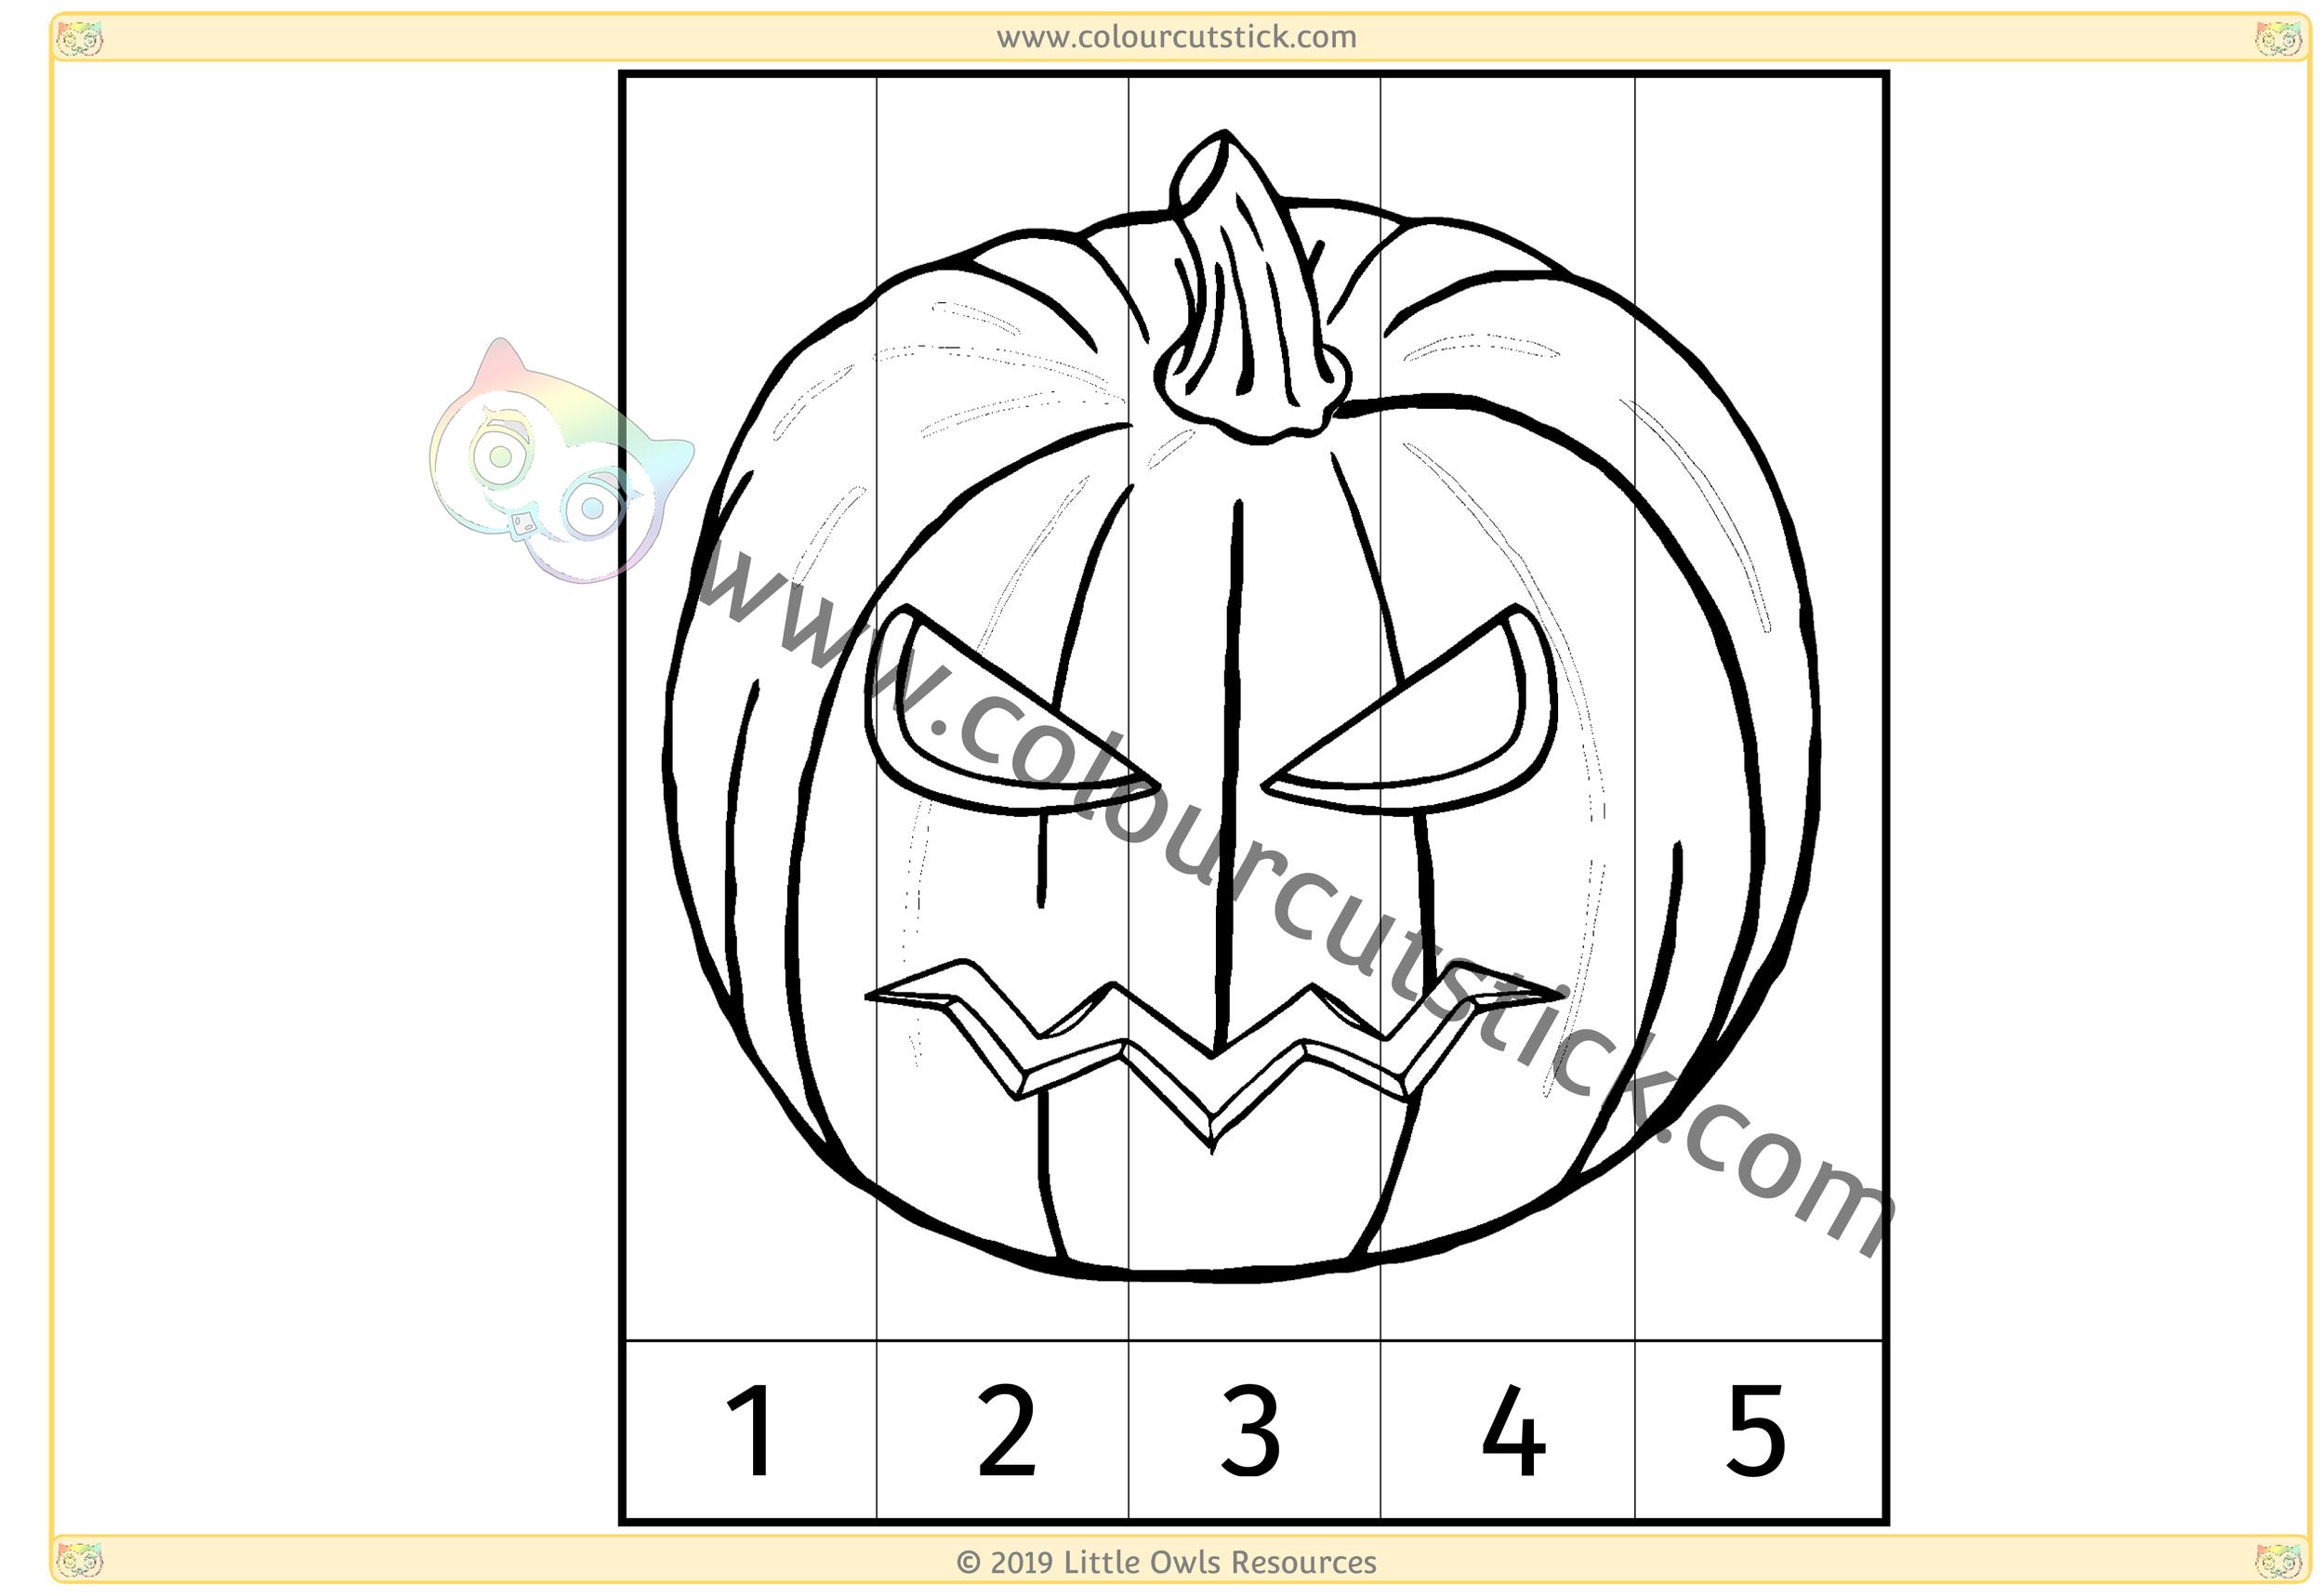 Spooky Pumpkin Number Slice Puzzle 1-5 -